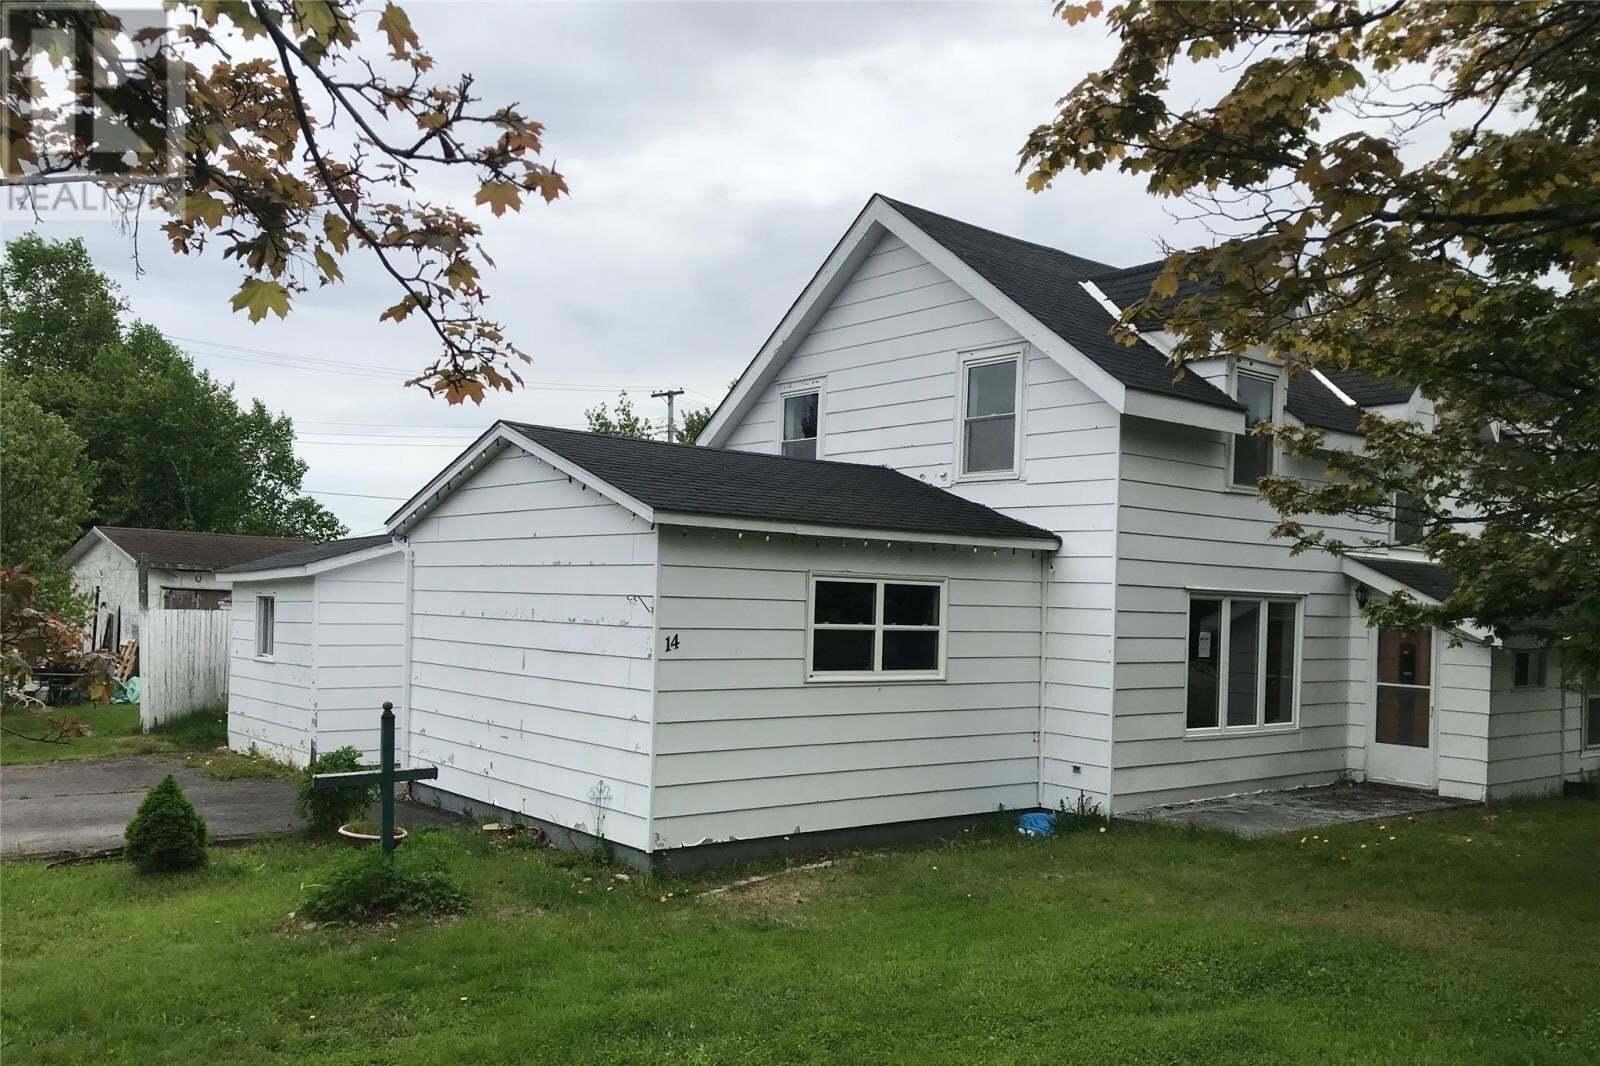 House for sale at 14 Circular Rd Grand Falls-windsor Newfoundland - MLS: 1199001